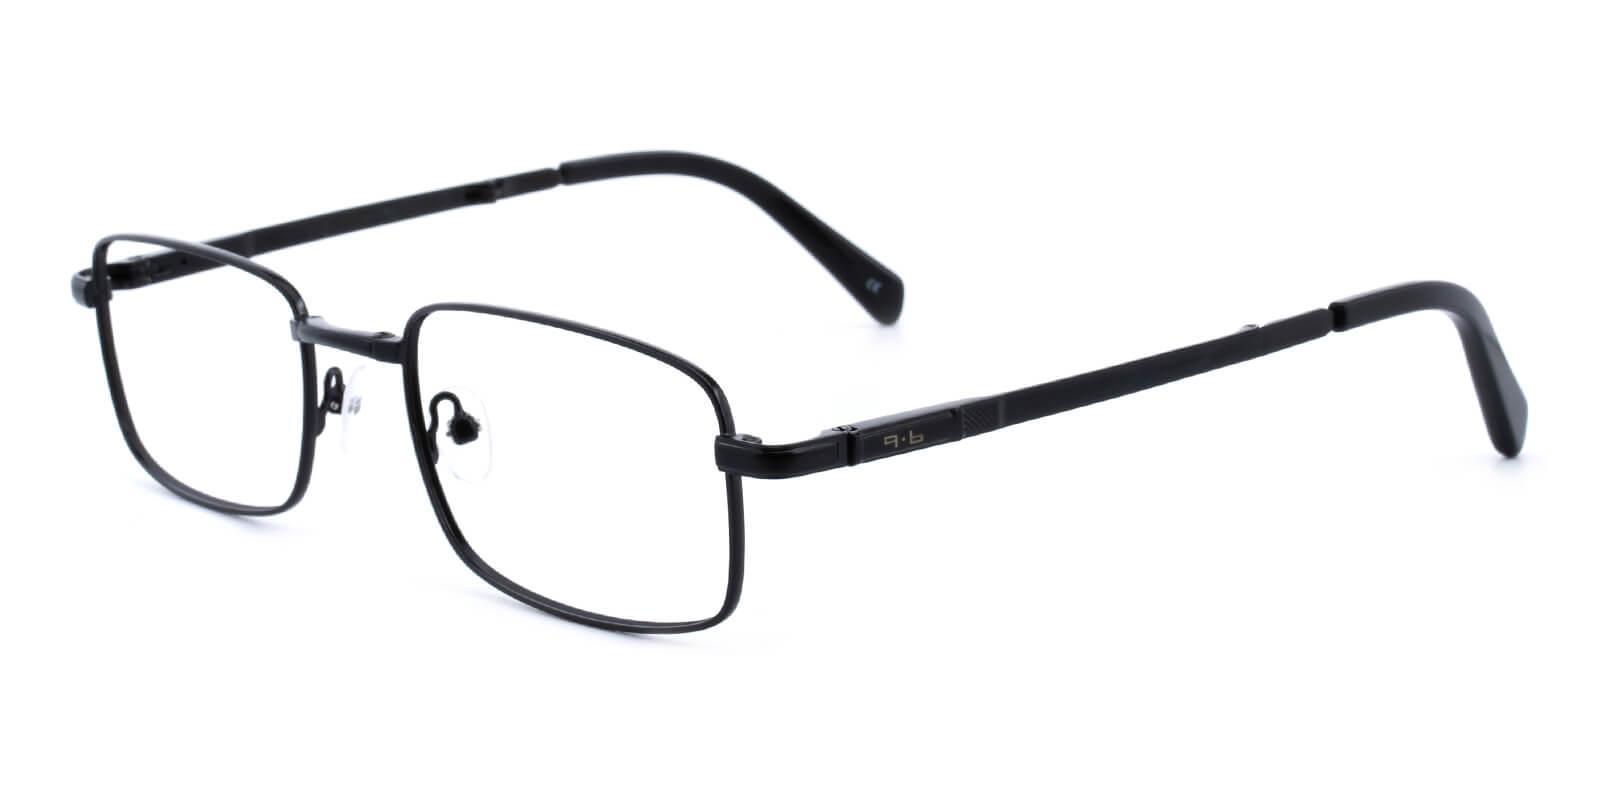 Norfolk-Black-Rectangle-Metal-Eyeglasses-additional1